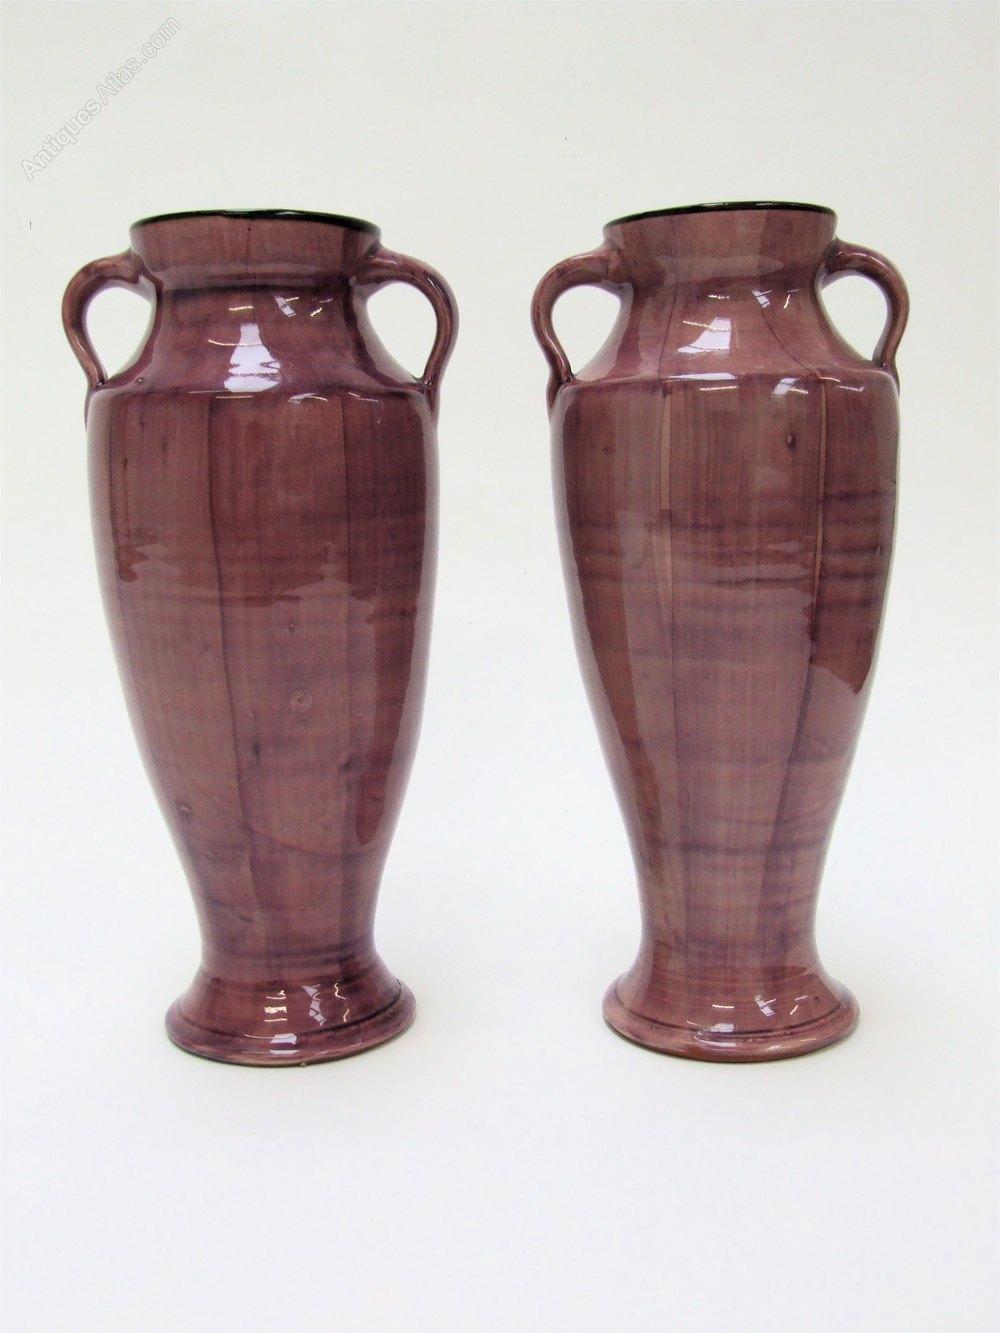 Antiques atlas superb pair lemon crute art pottery bird vases pottery bird vases other makers reviewsmspy